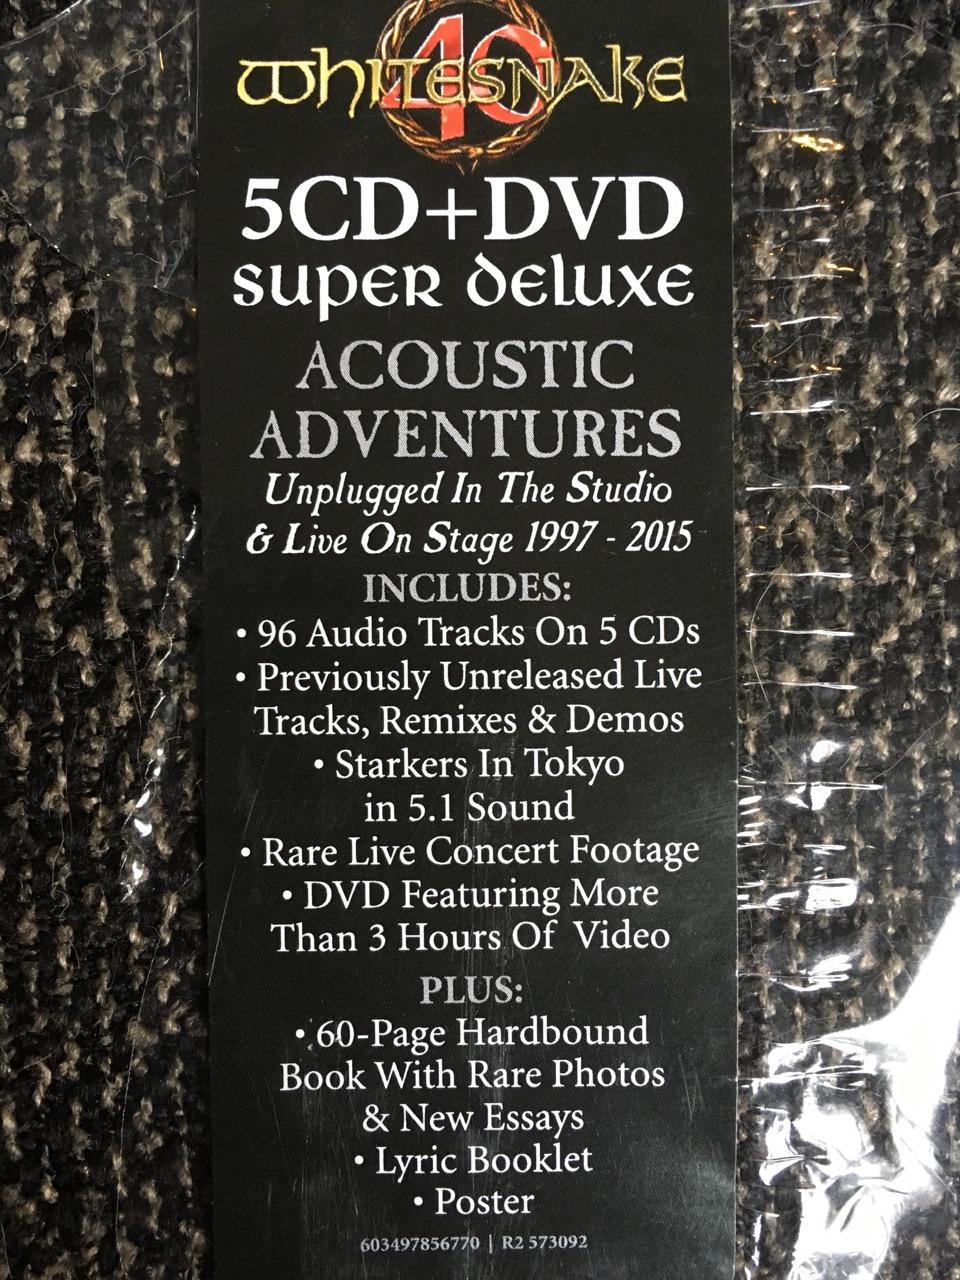 WHITESNAKE STARKERS IN DOWNLOAD DVD GRÁTIS TOKYO